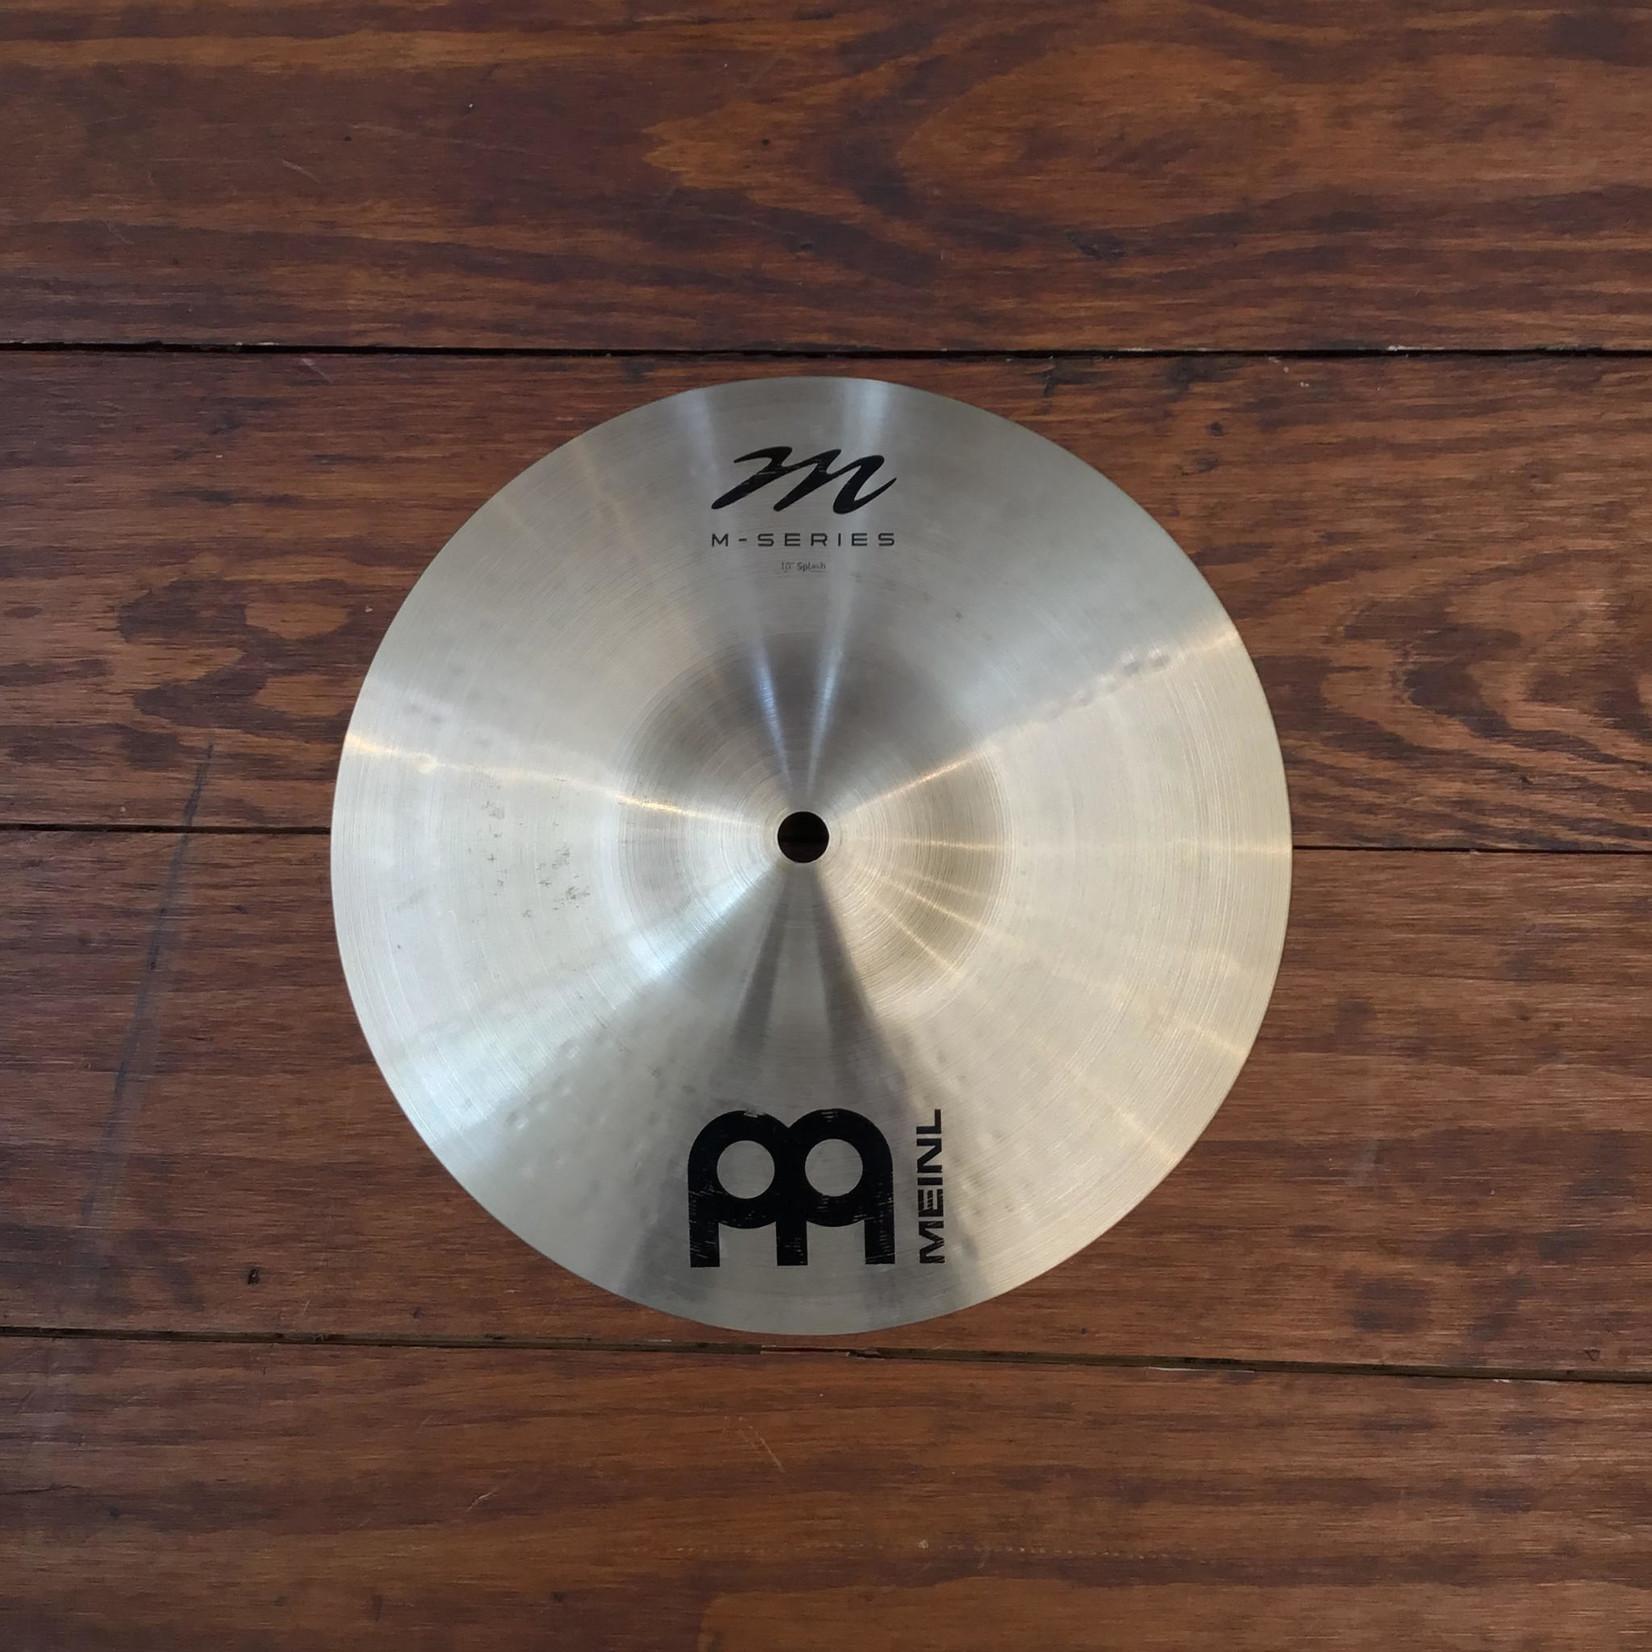 "Meinl USED Meinl M Series 10"" Splash Cymbal"